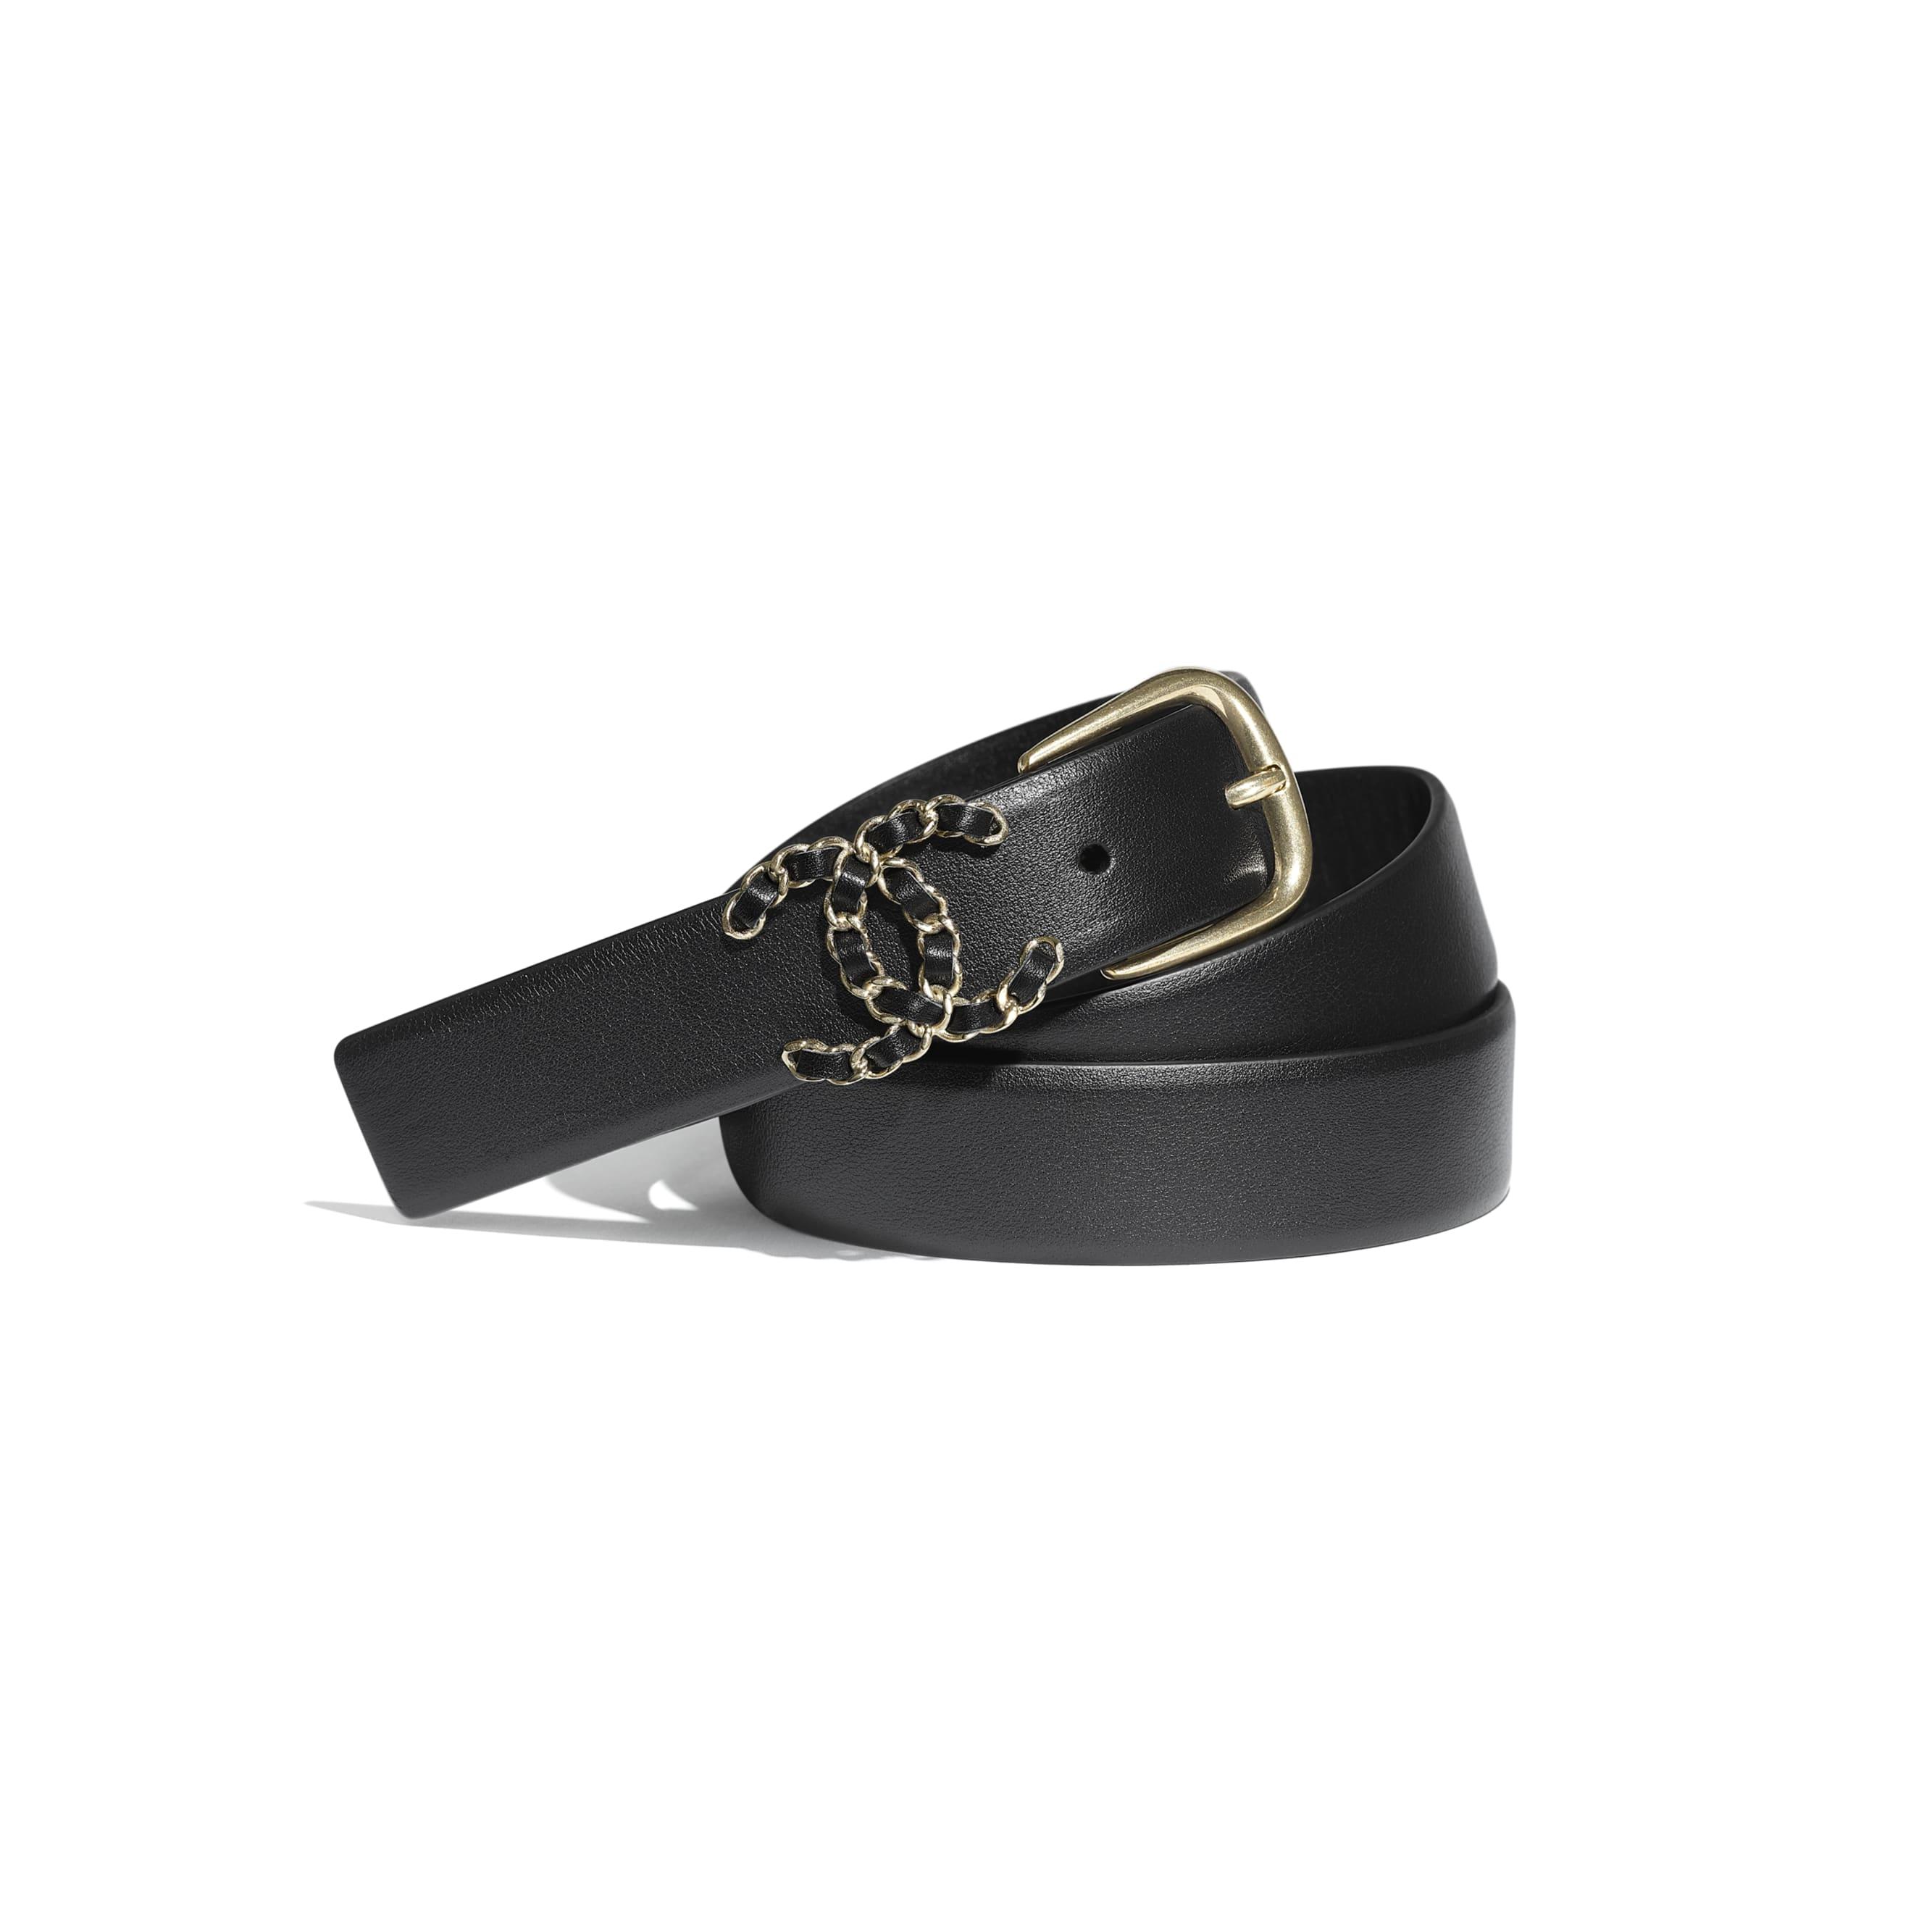 Belt - Black - Calfskin & Gold-Tone Metal - CHANEL - Default view - see standard sized version